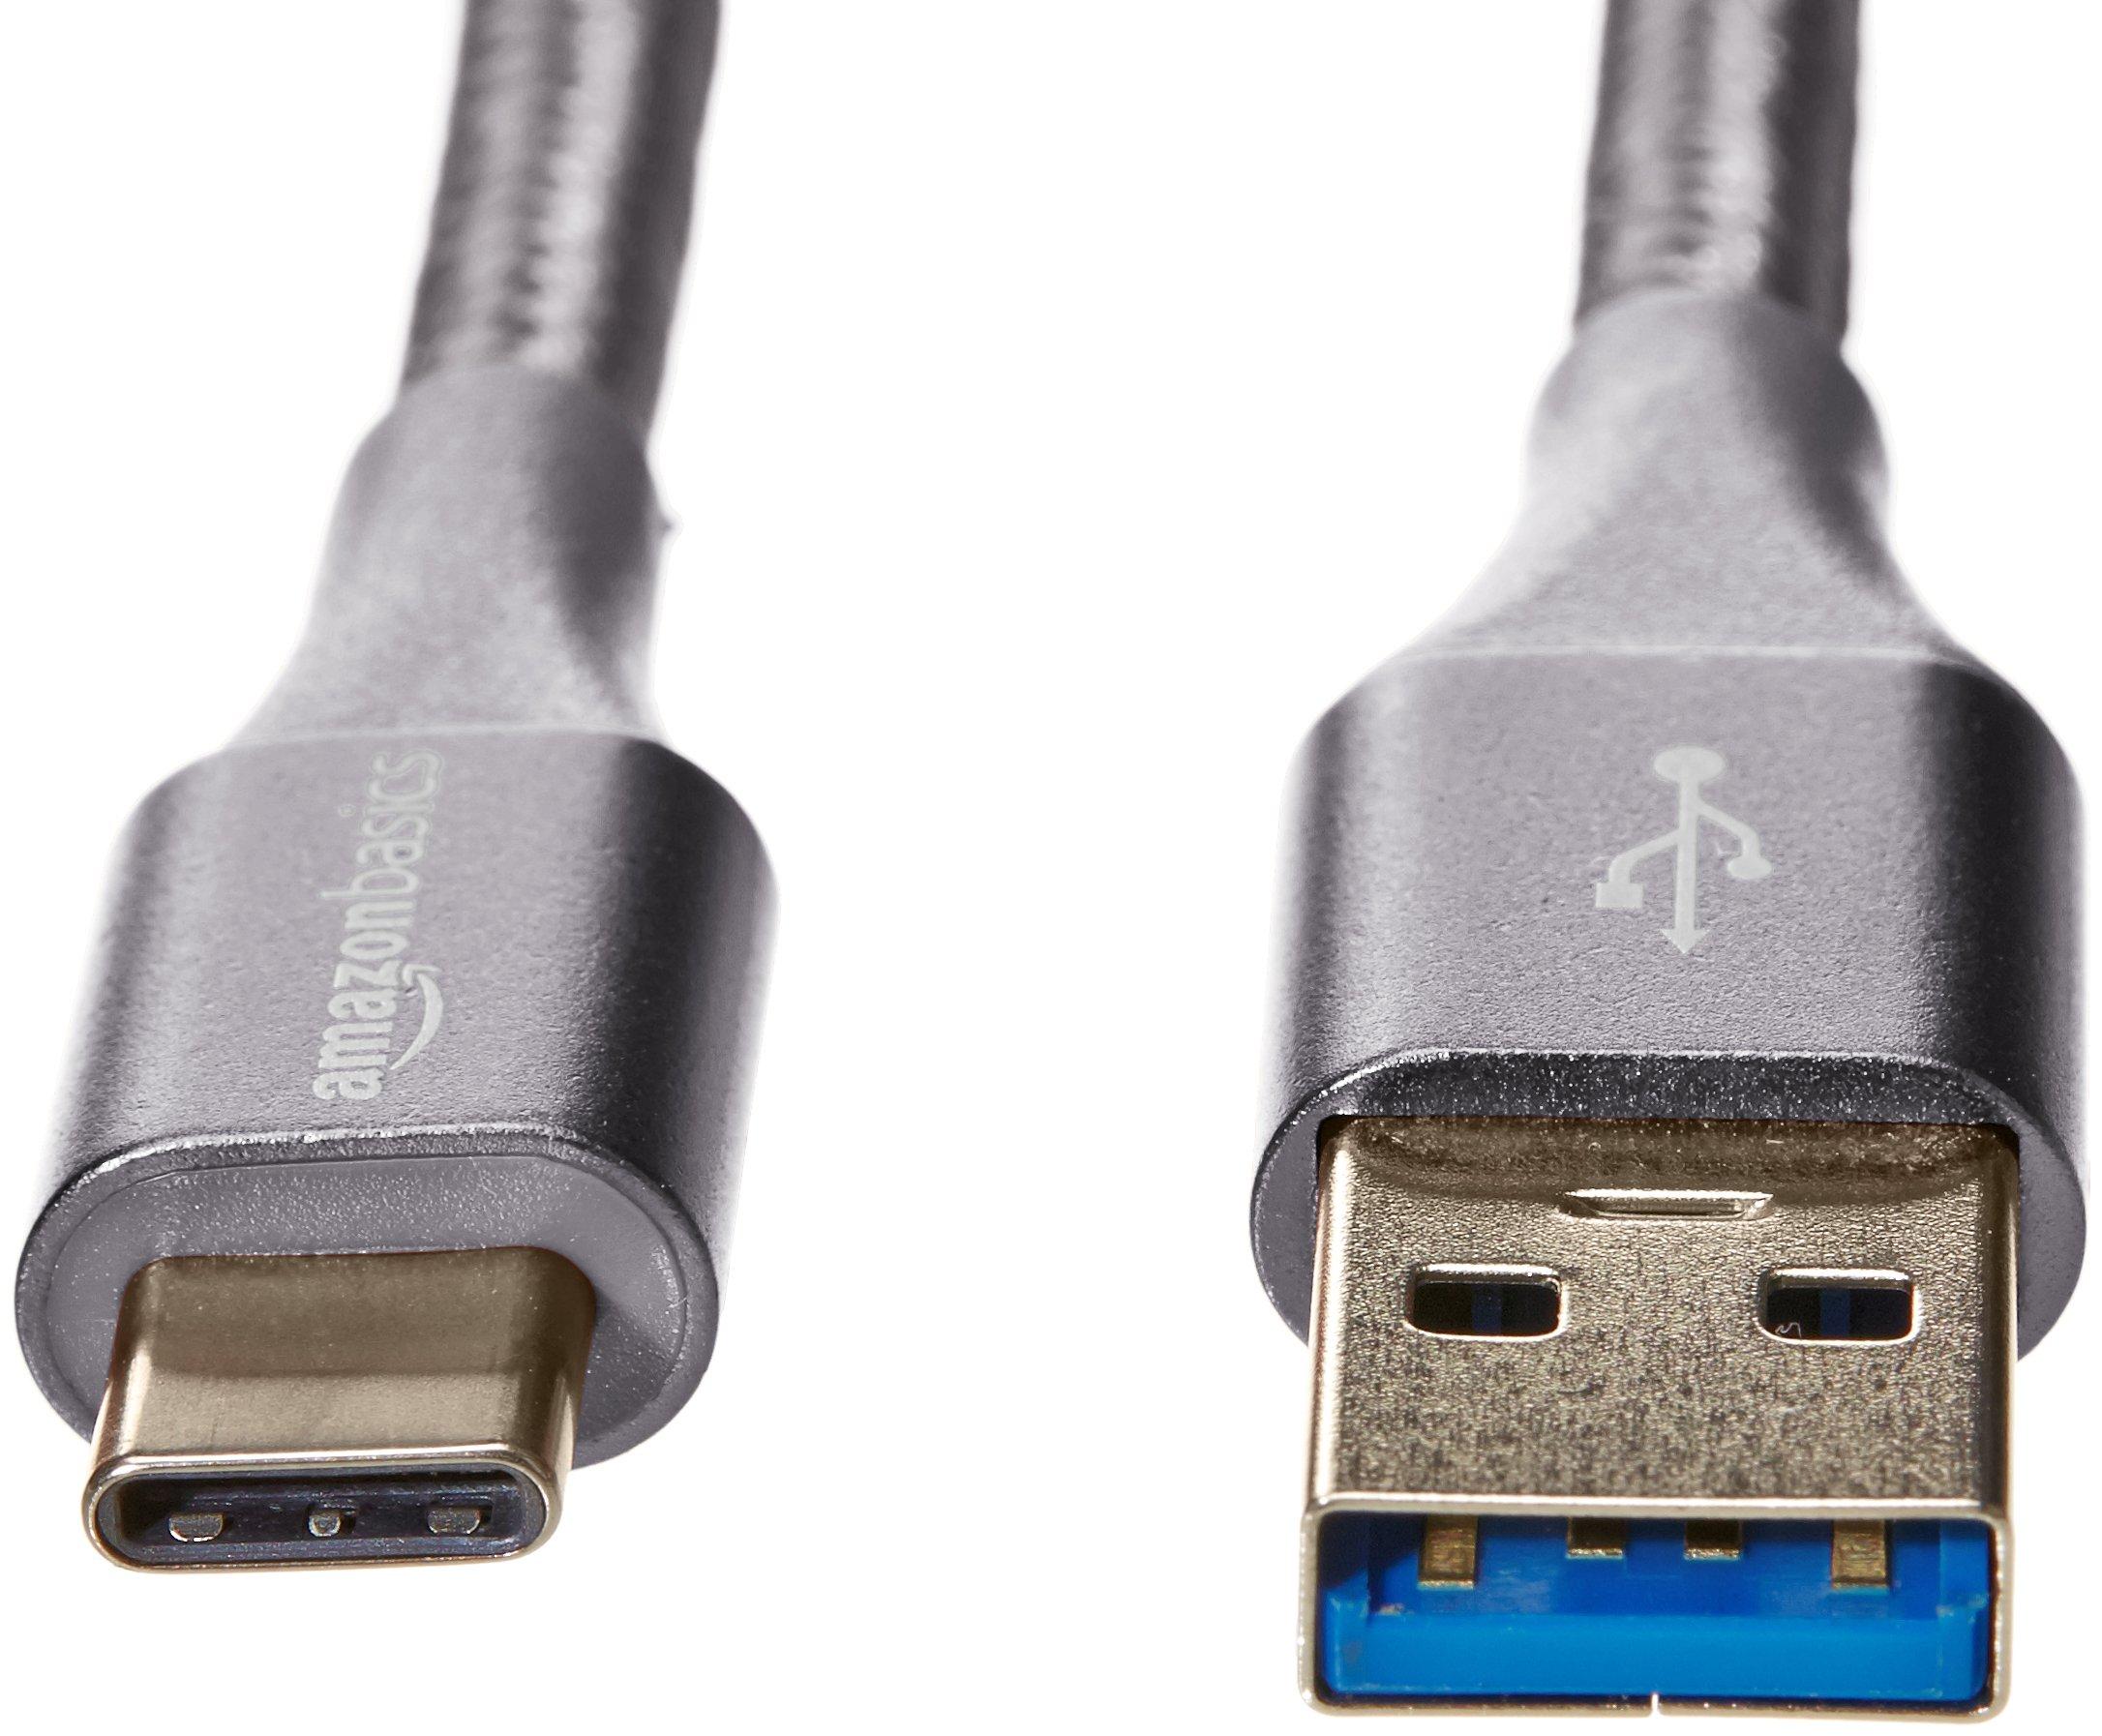 AmazonBasics Double Braided Nylon USB Type-C to Type-A 3.1 Gen 2 Cable   1 feet, Dark Grey by AmazonBasics (Image #4)